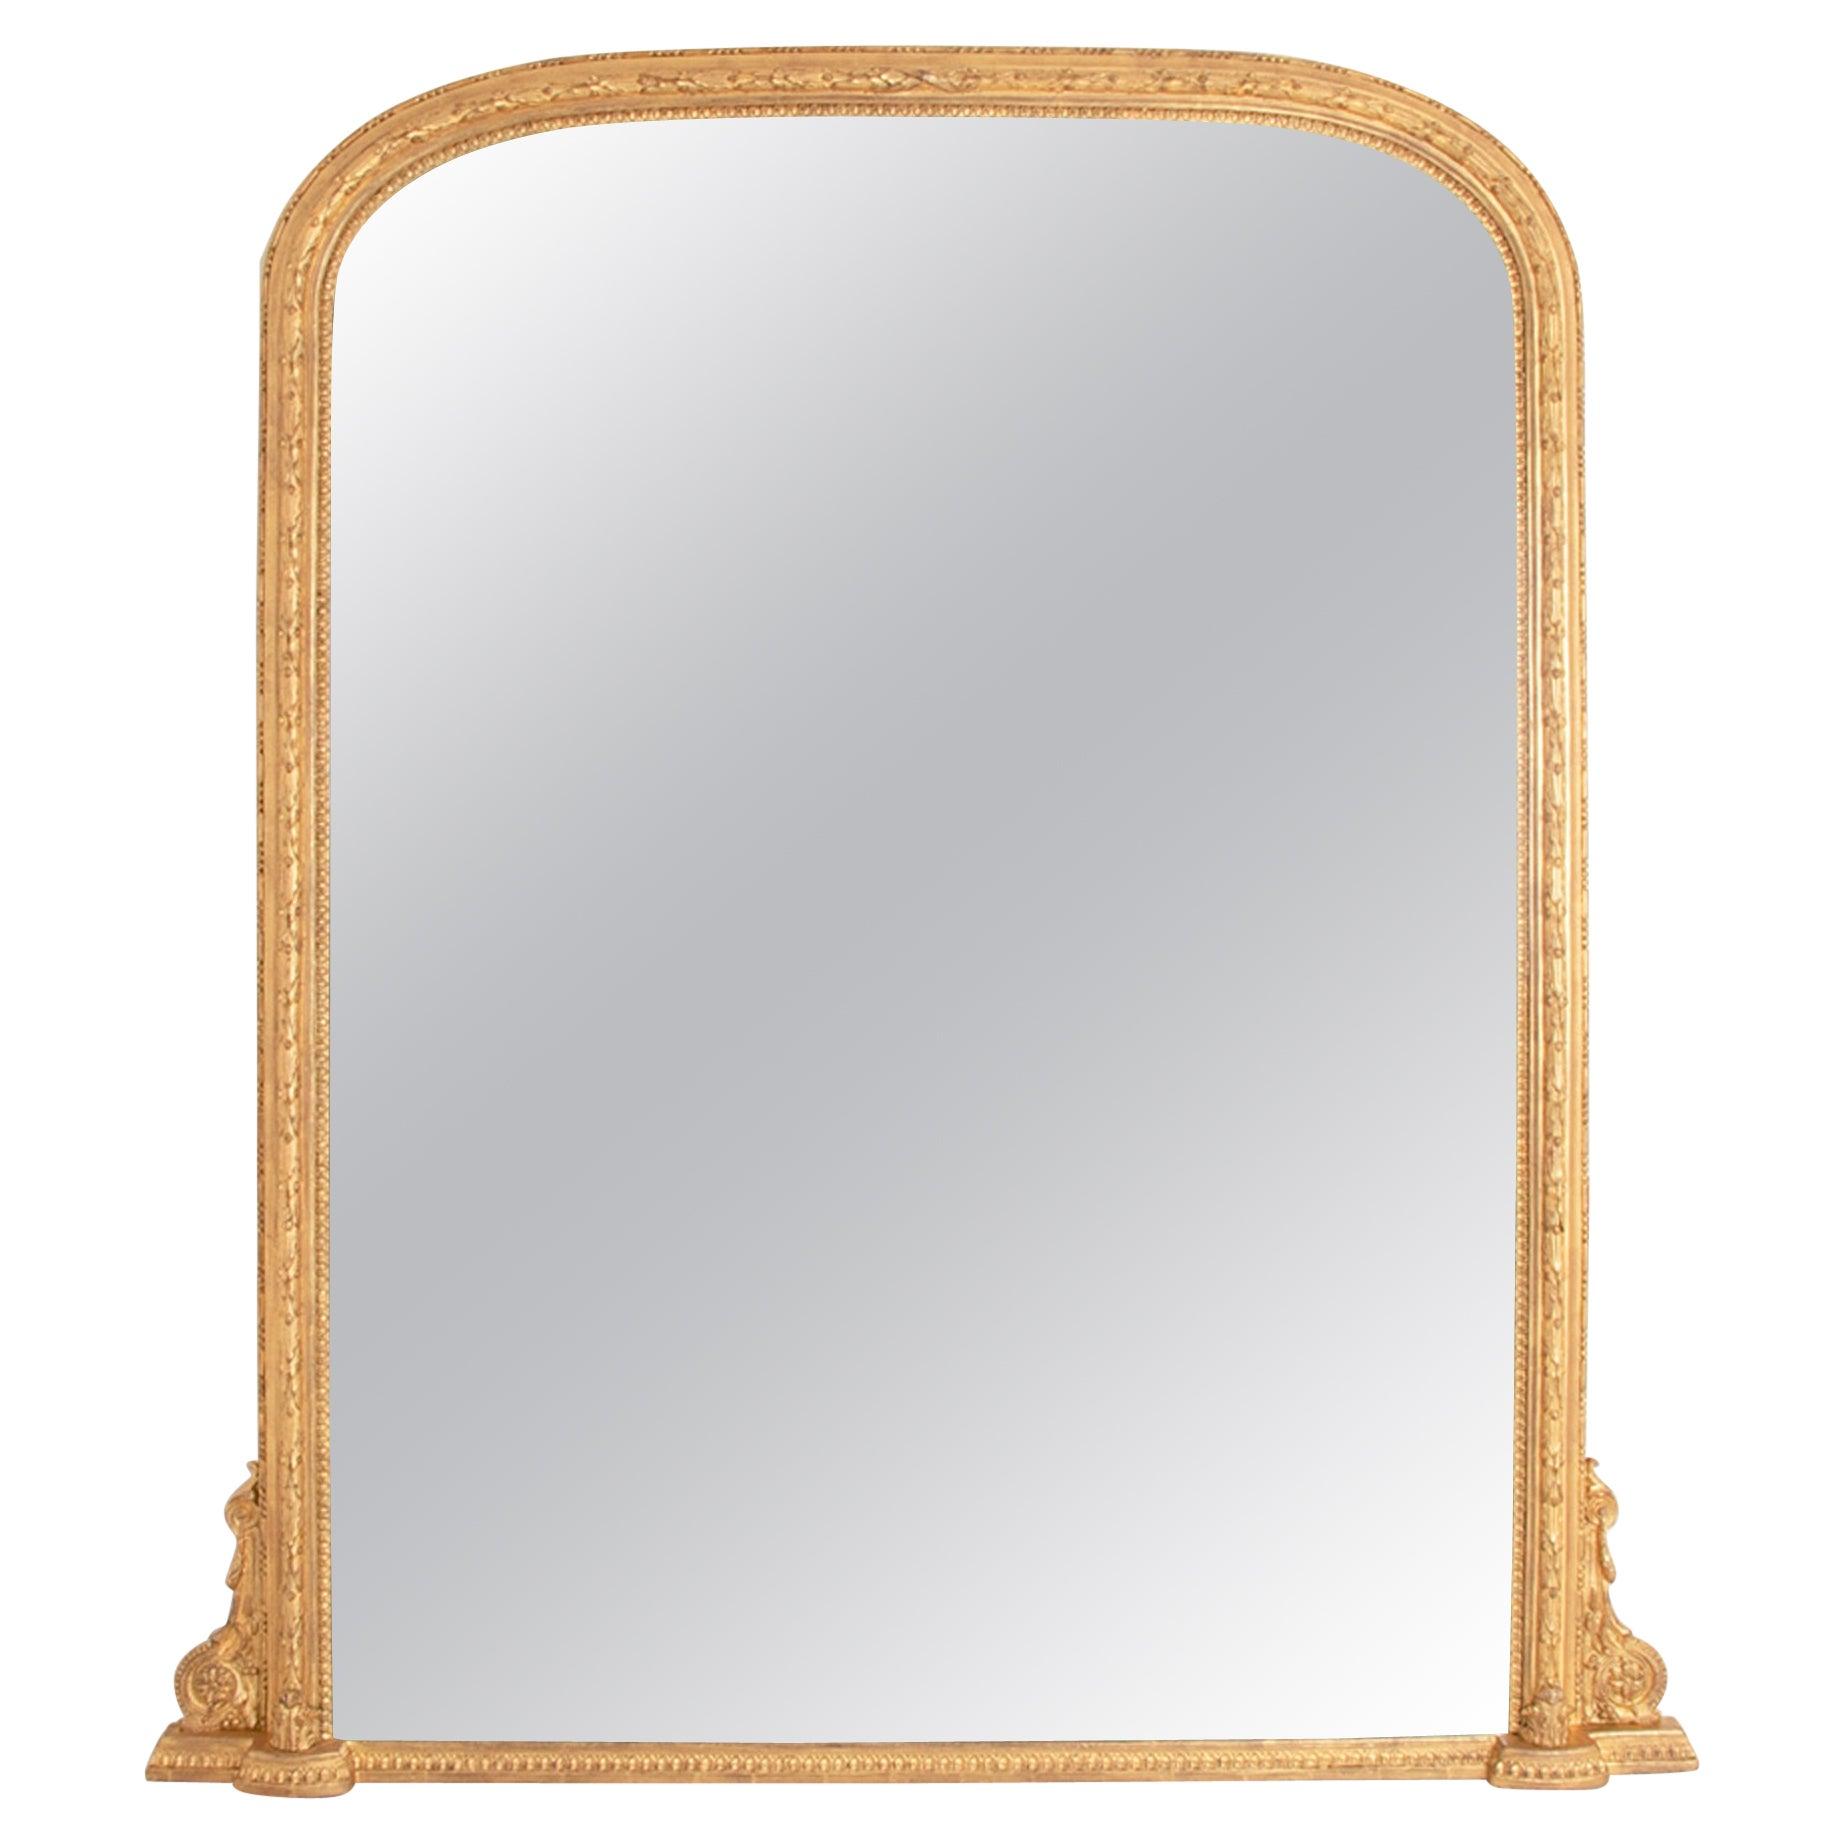 Large English Gilded Overmantle Mirror, c.1860